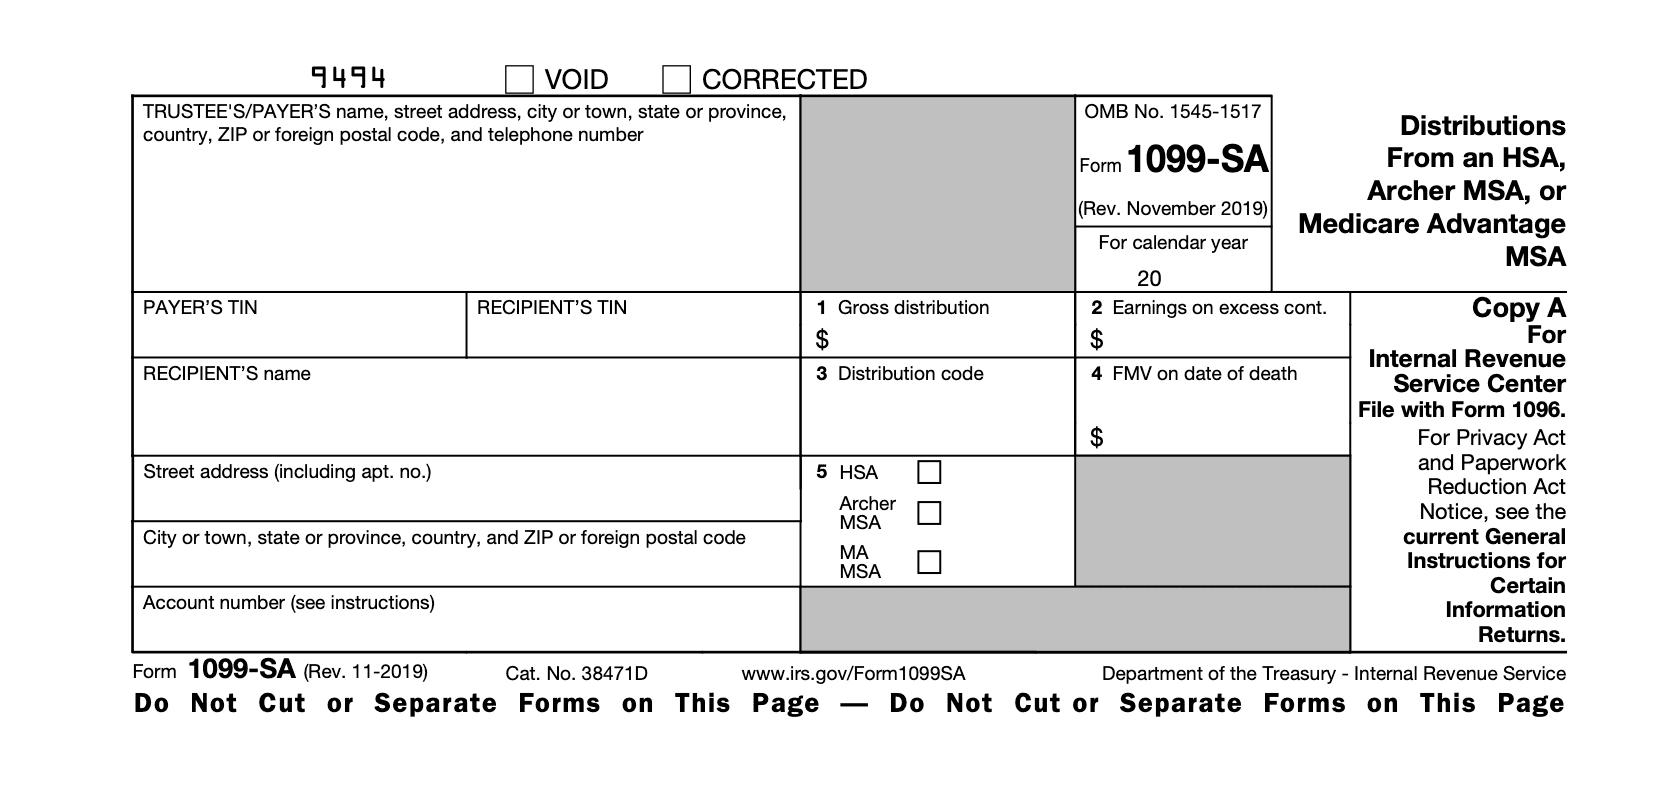 1099-SA